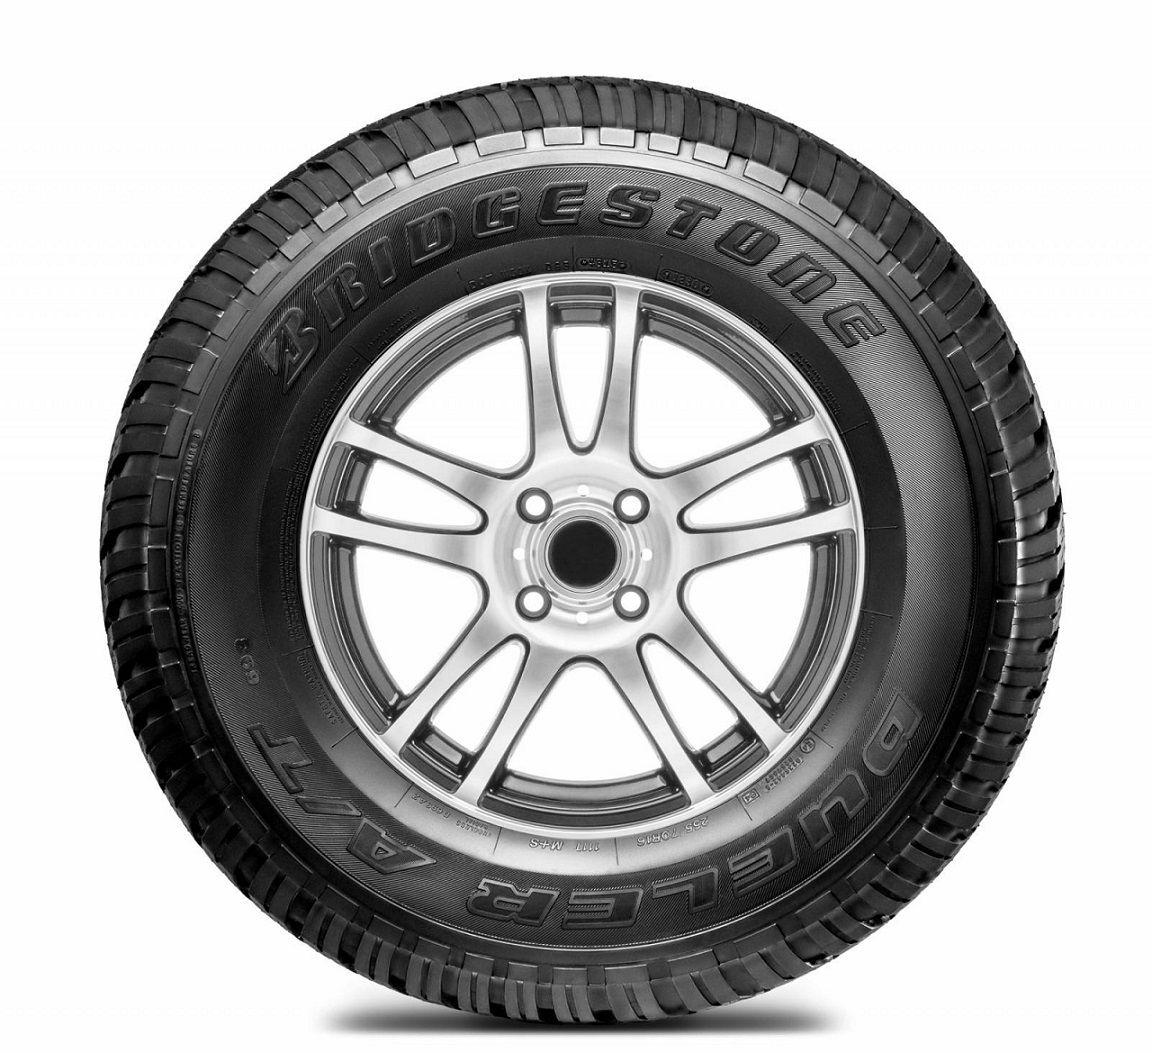 Pneu 255/75 R 15 - Dueler A/t 693 109/105s Bridgestone